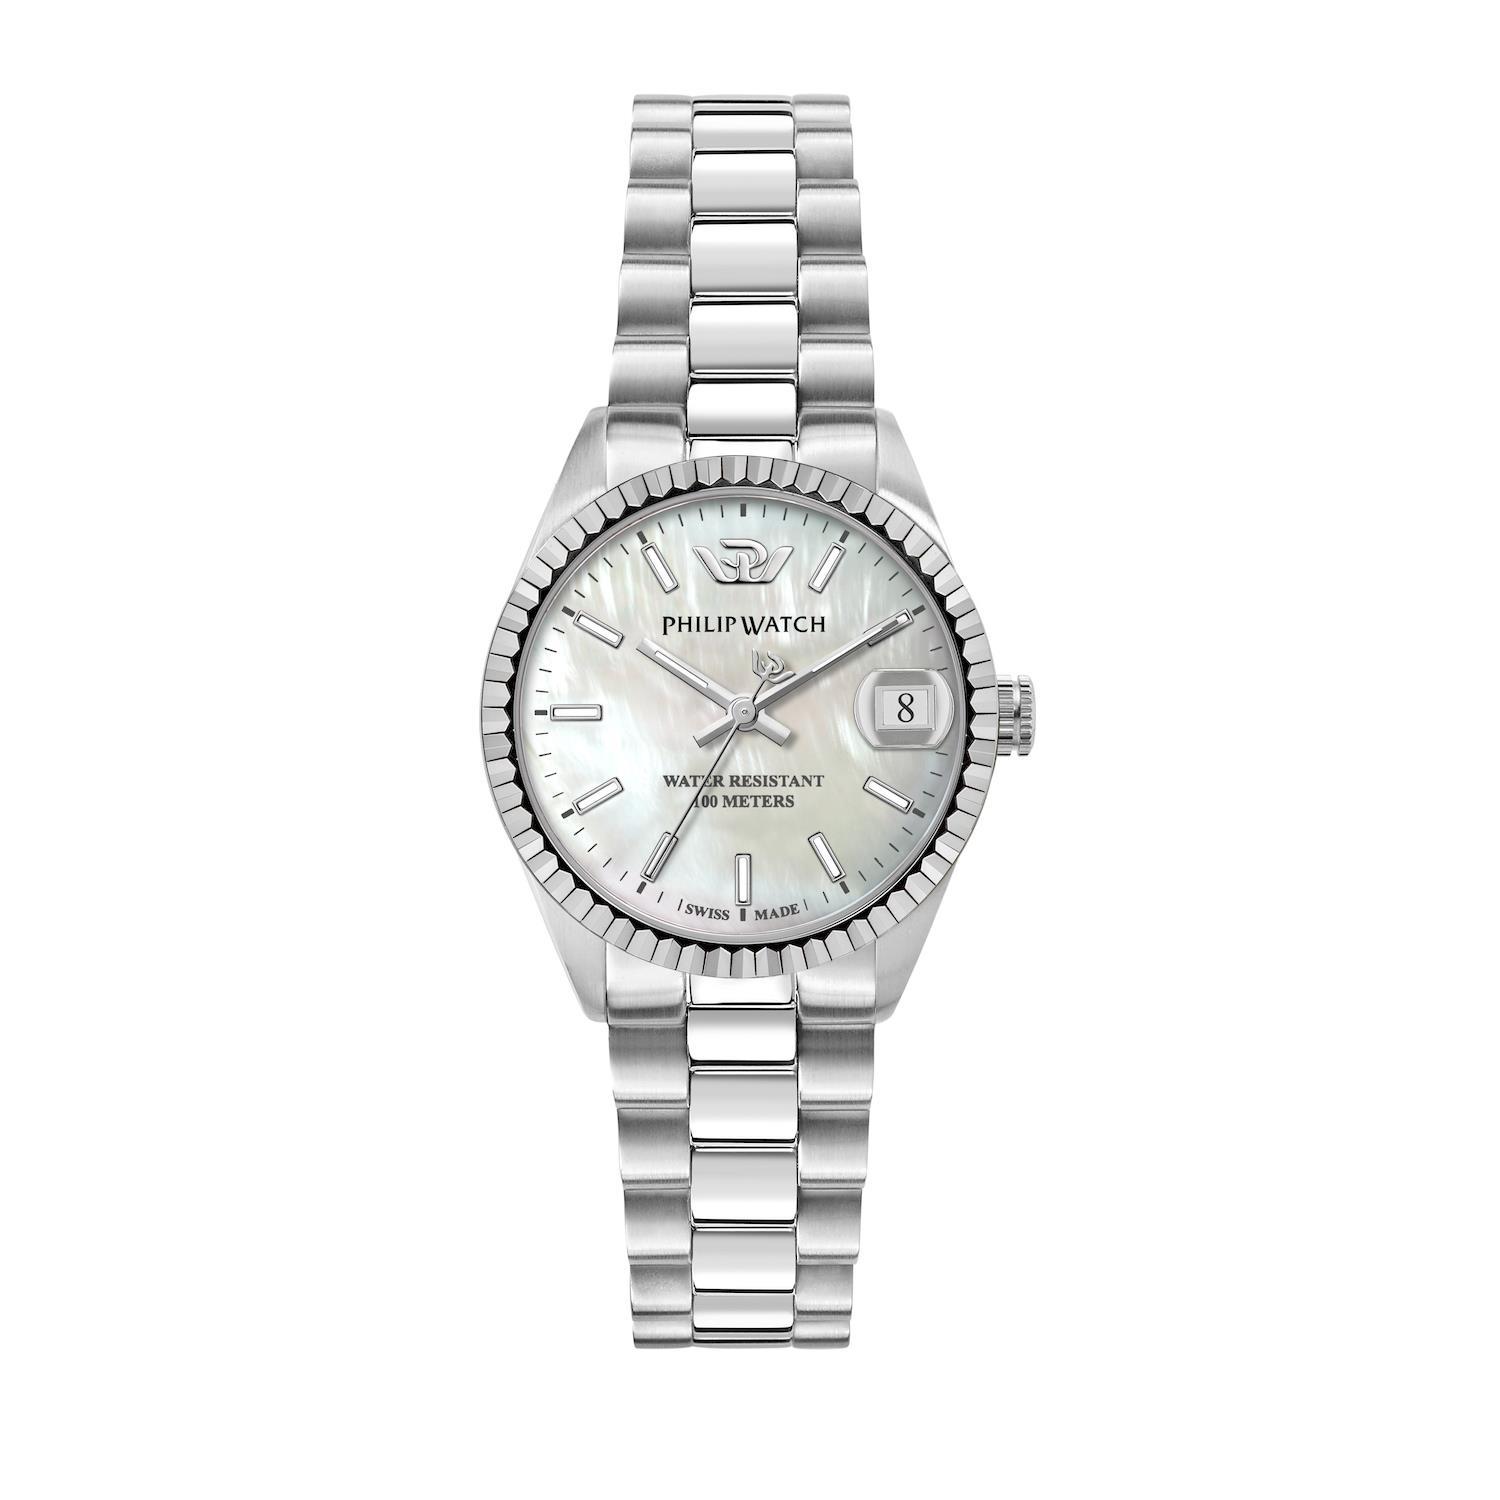 Orologio Philip Watch Caribe Lady Ref. R8253597581 - PHILIP WATCH